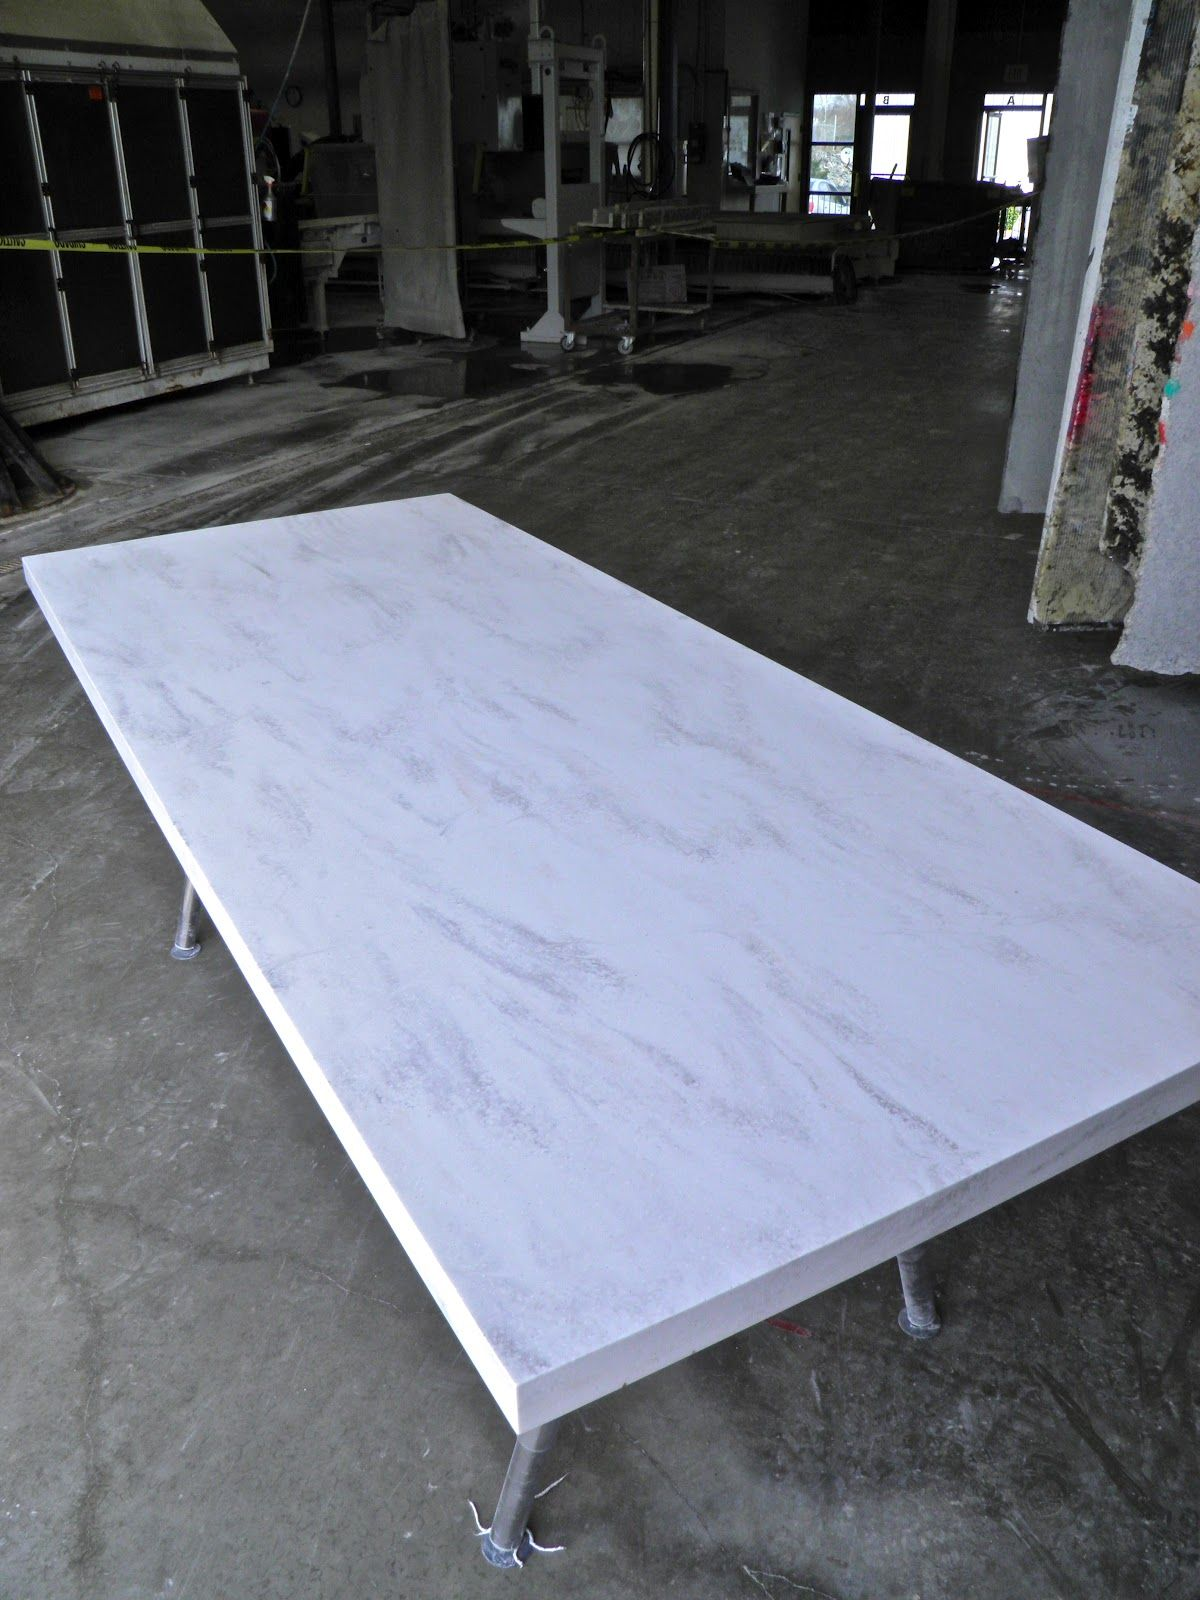 corian kitchen countertops Corian rain cloud use for kitchen countertops and backsplash